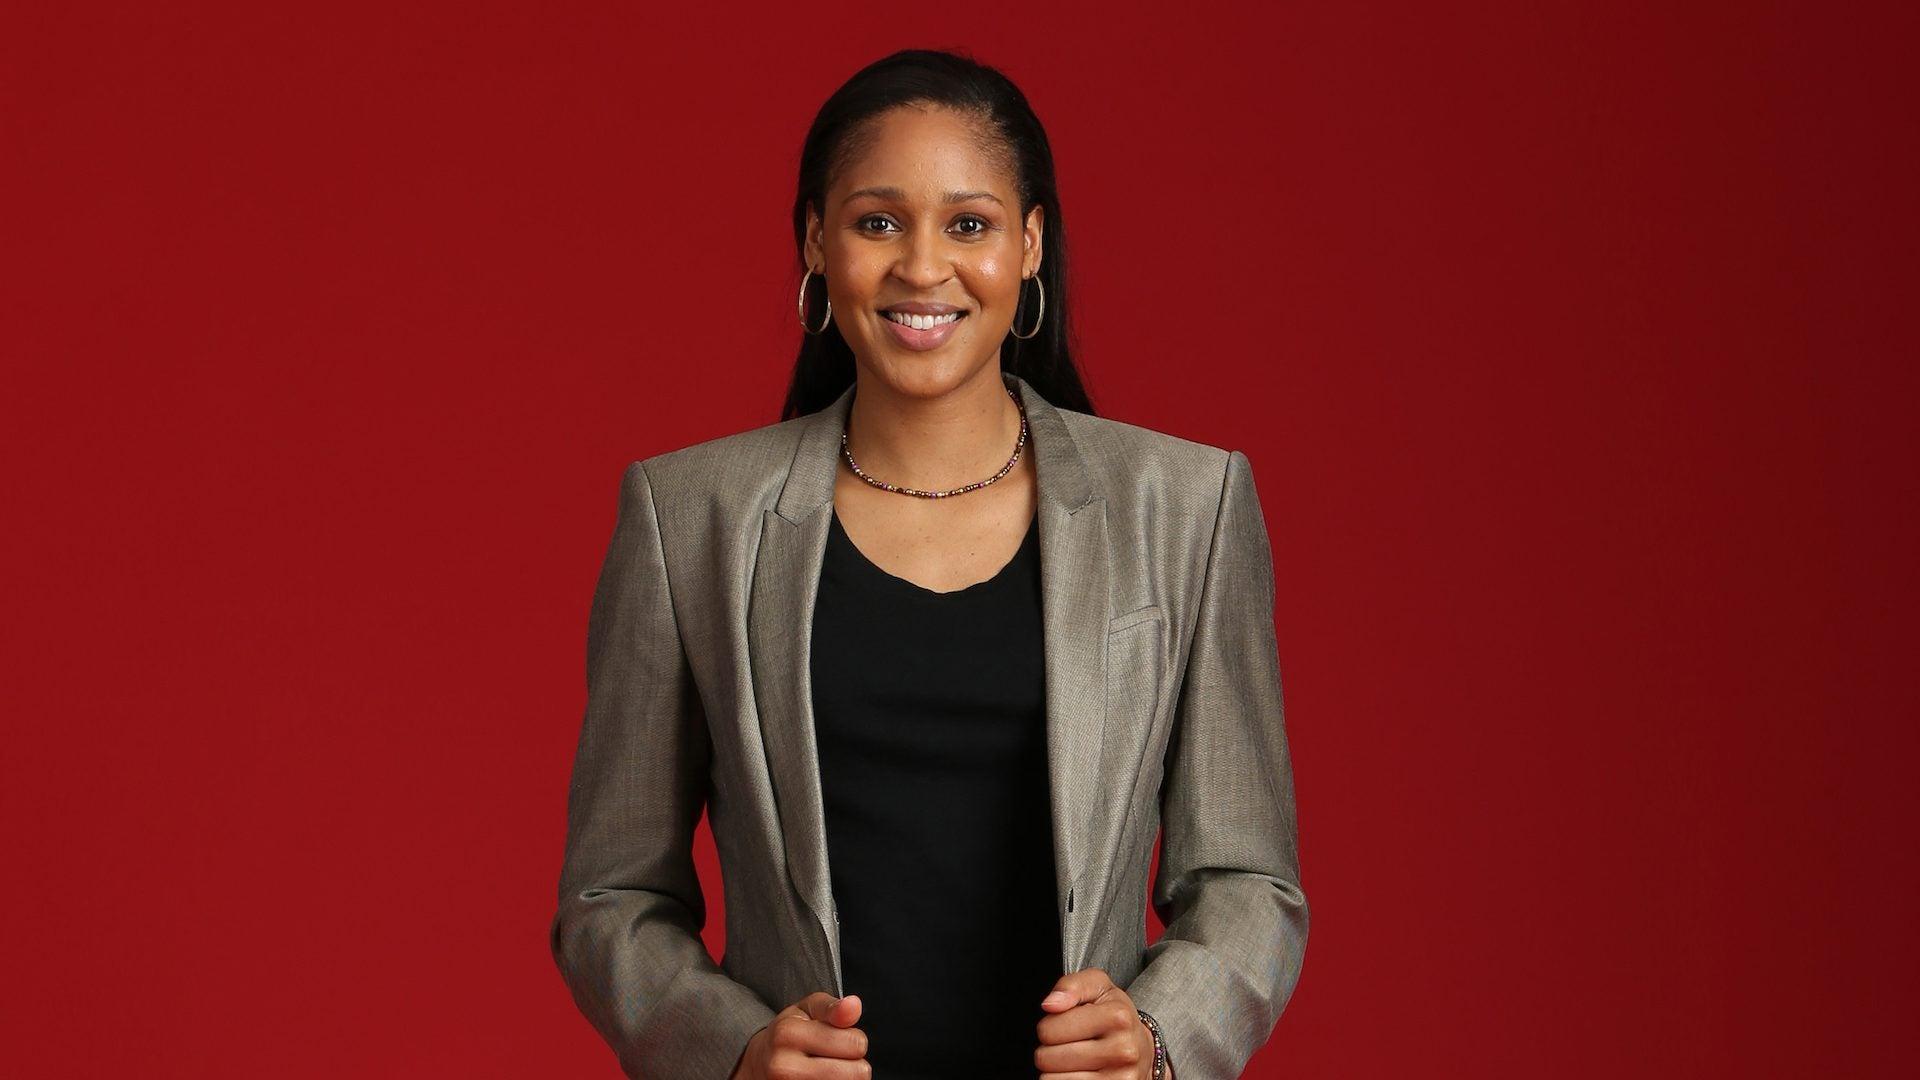 WNBA Star Maya Moore Helped Jonathan Irons Win His Freedom